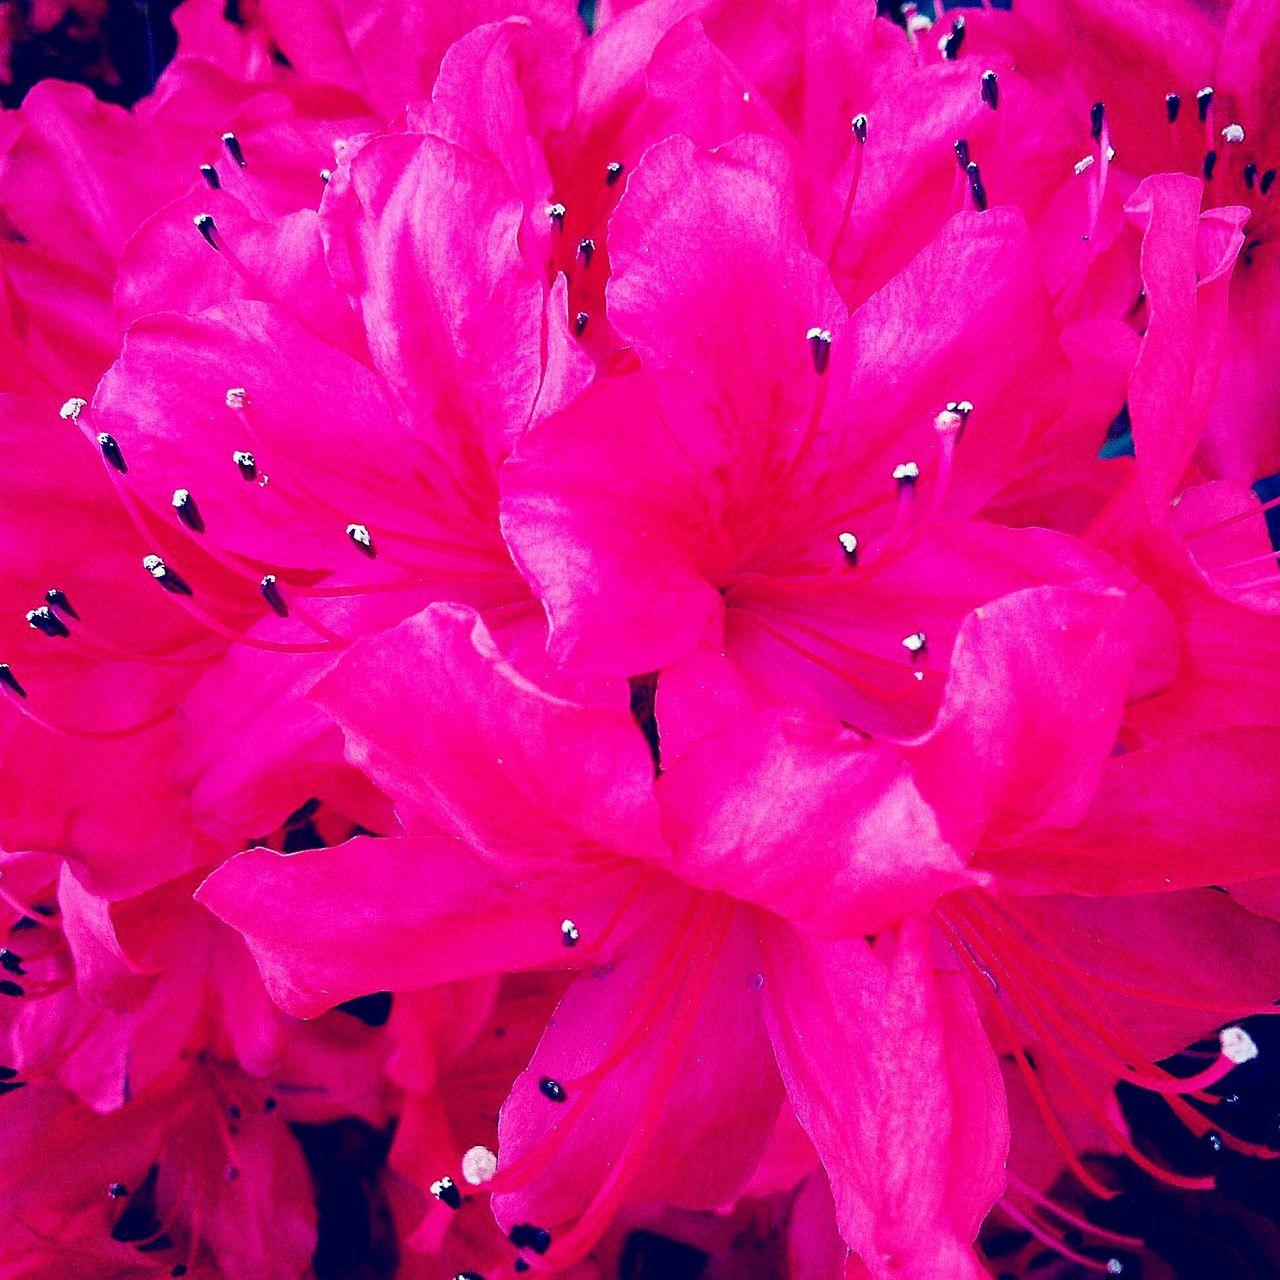 Flowers Enjoying Life Relaxing Eyemphotography Taking Photos EyeEm Nature Lover Spring Flower Power Flowers_collection